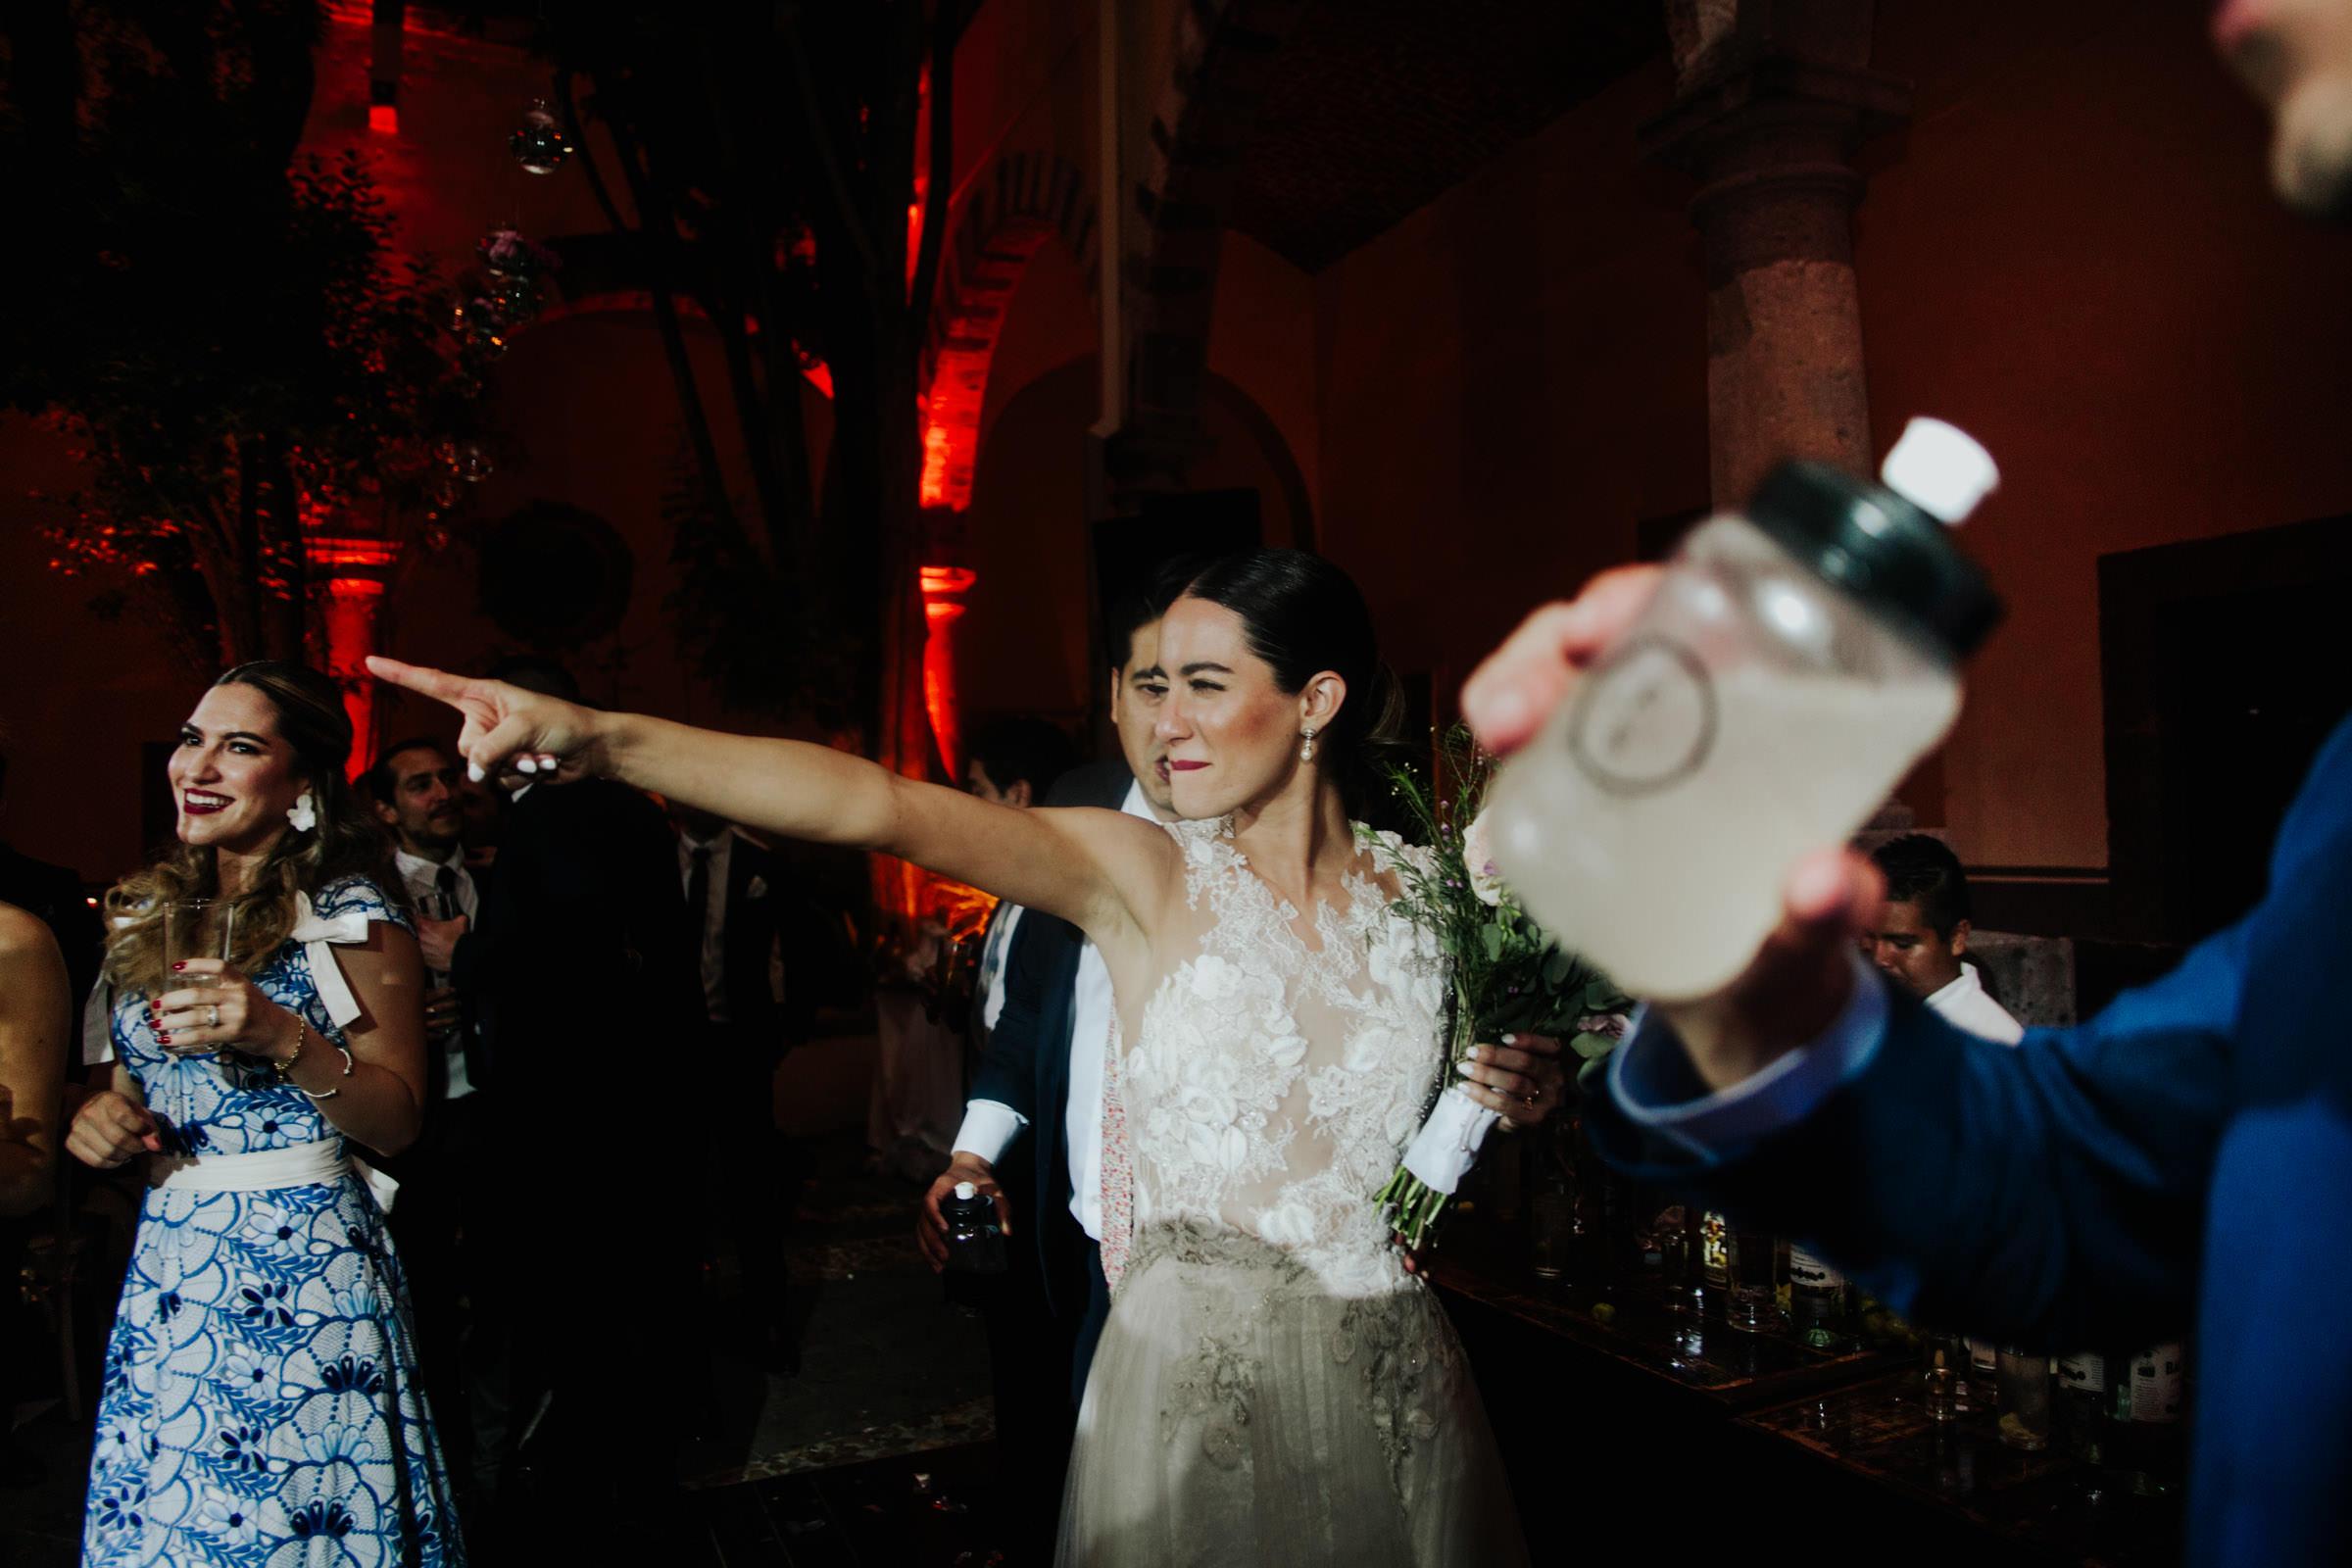 San-Miguel-de-Allende-Wedding-Photography-Parroquia-Instituto-Boda-Fotografia-Fer-Sergio-Pierce-Lifestyle-Photography0079.JPG